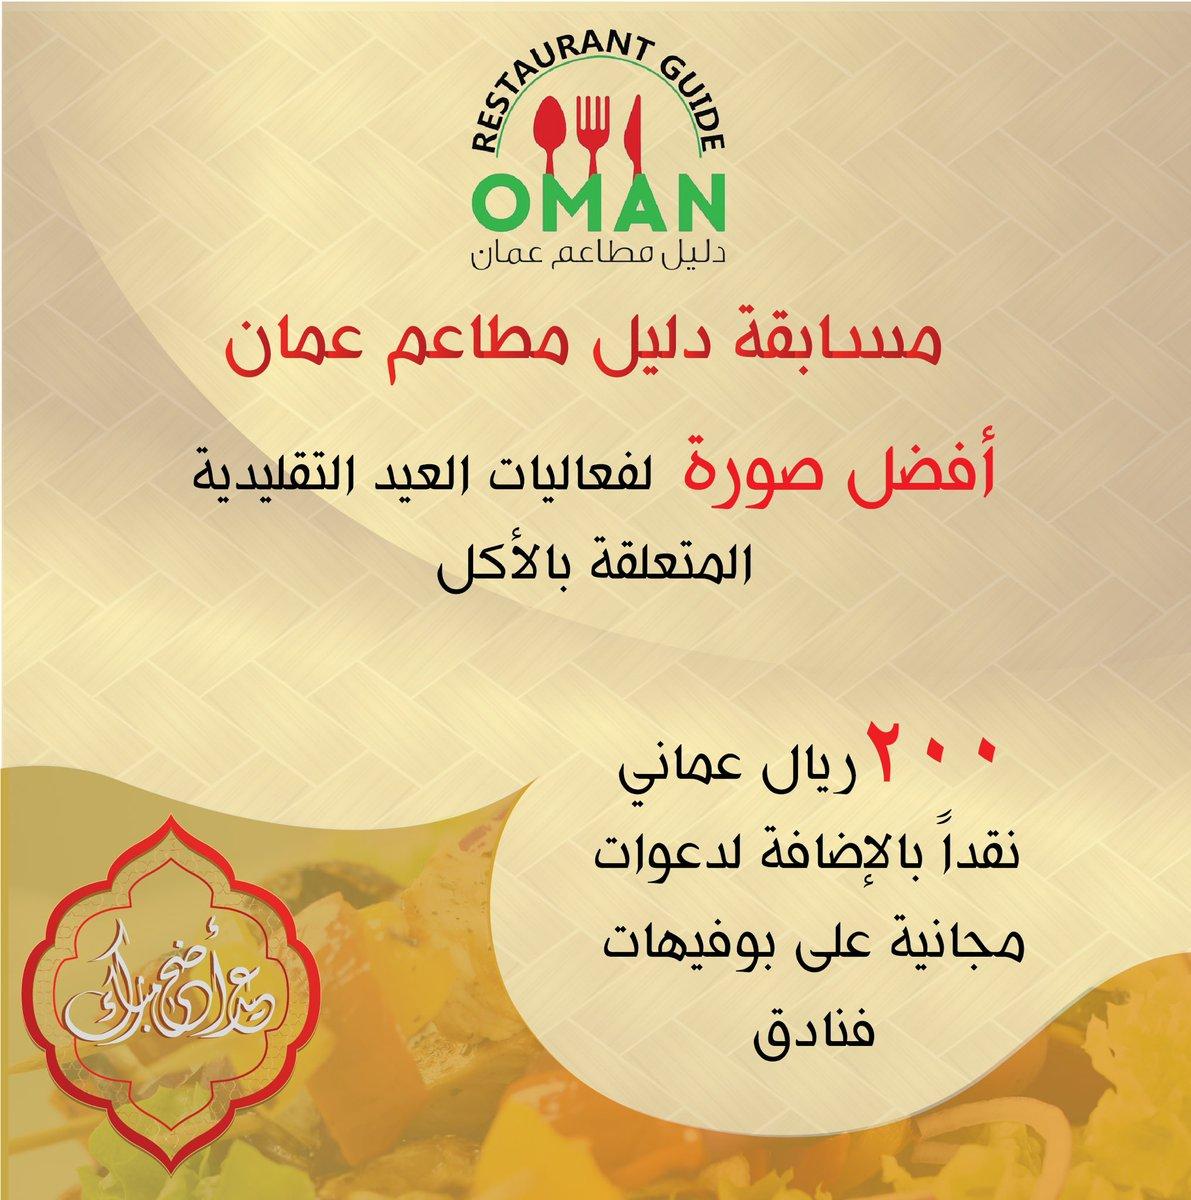 d6b48d996 دليل مطاعم عُمان (@rg_oman)   Twitter